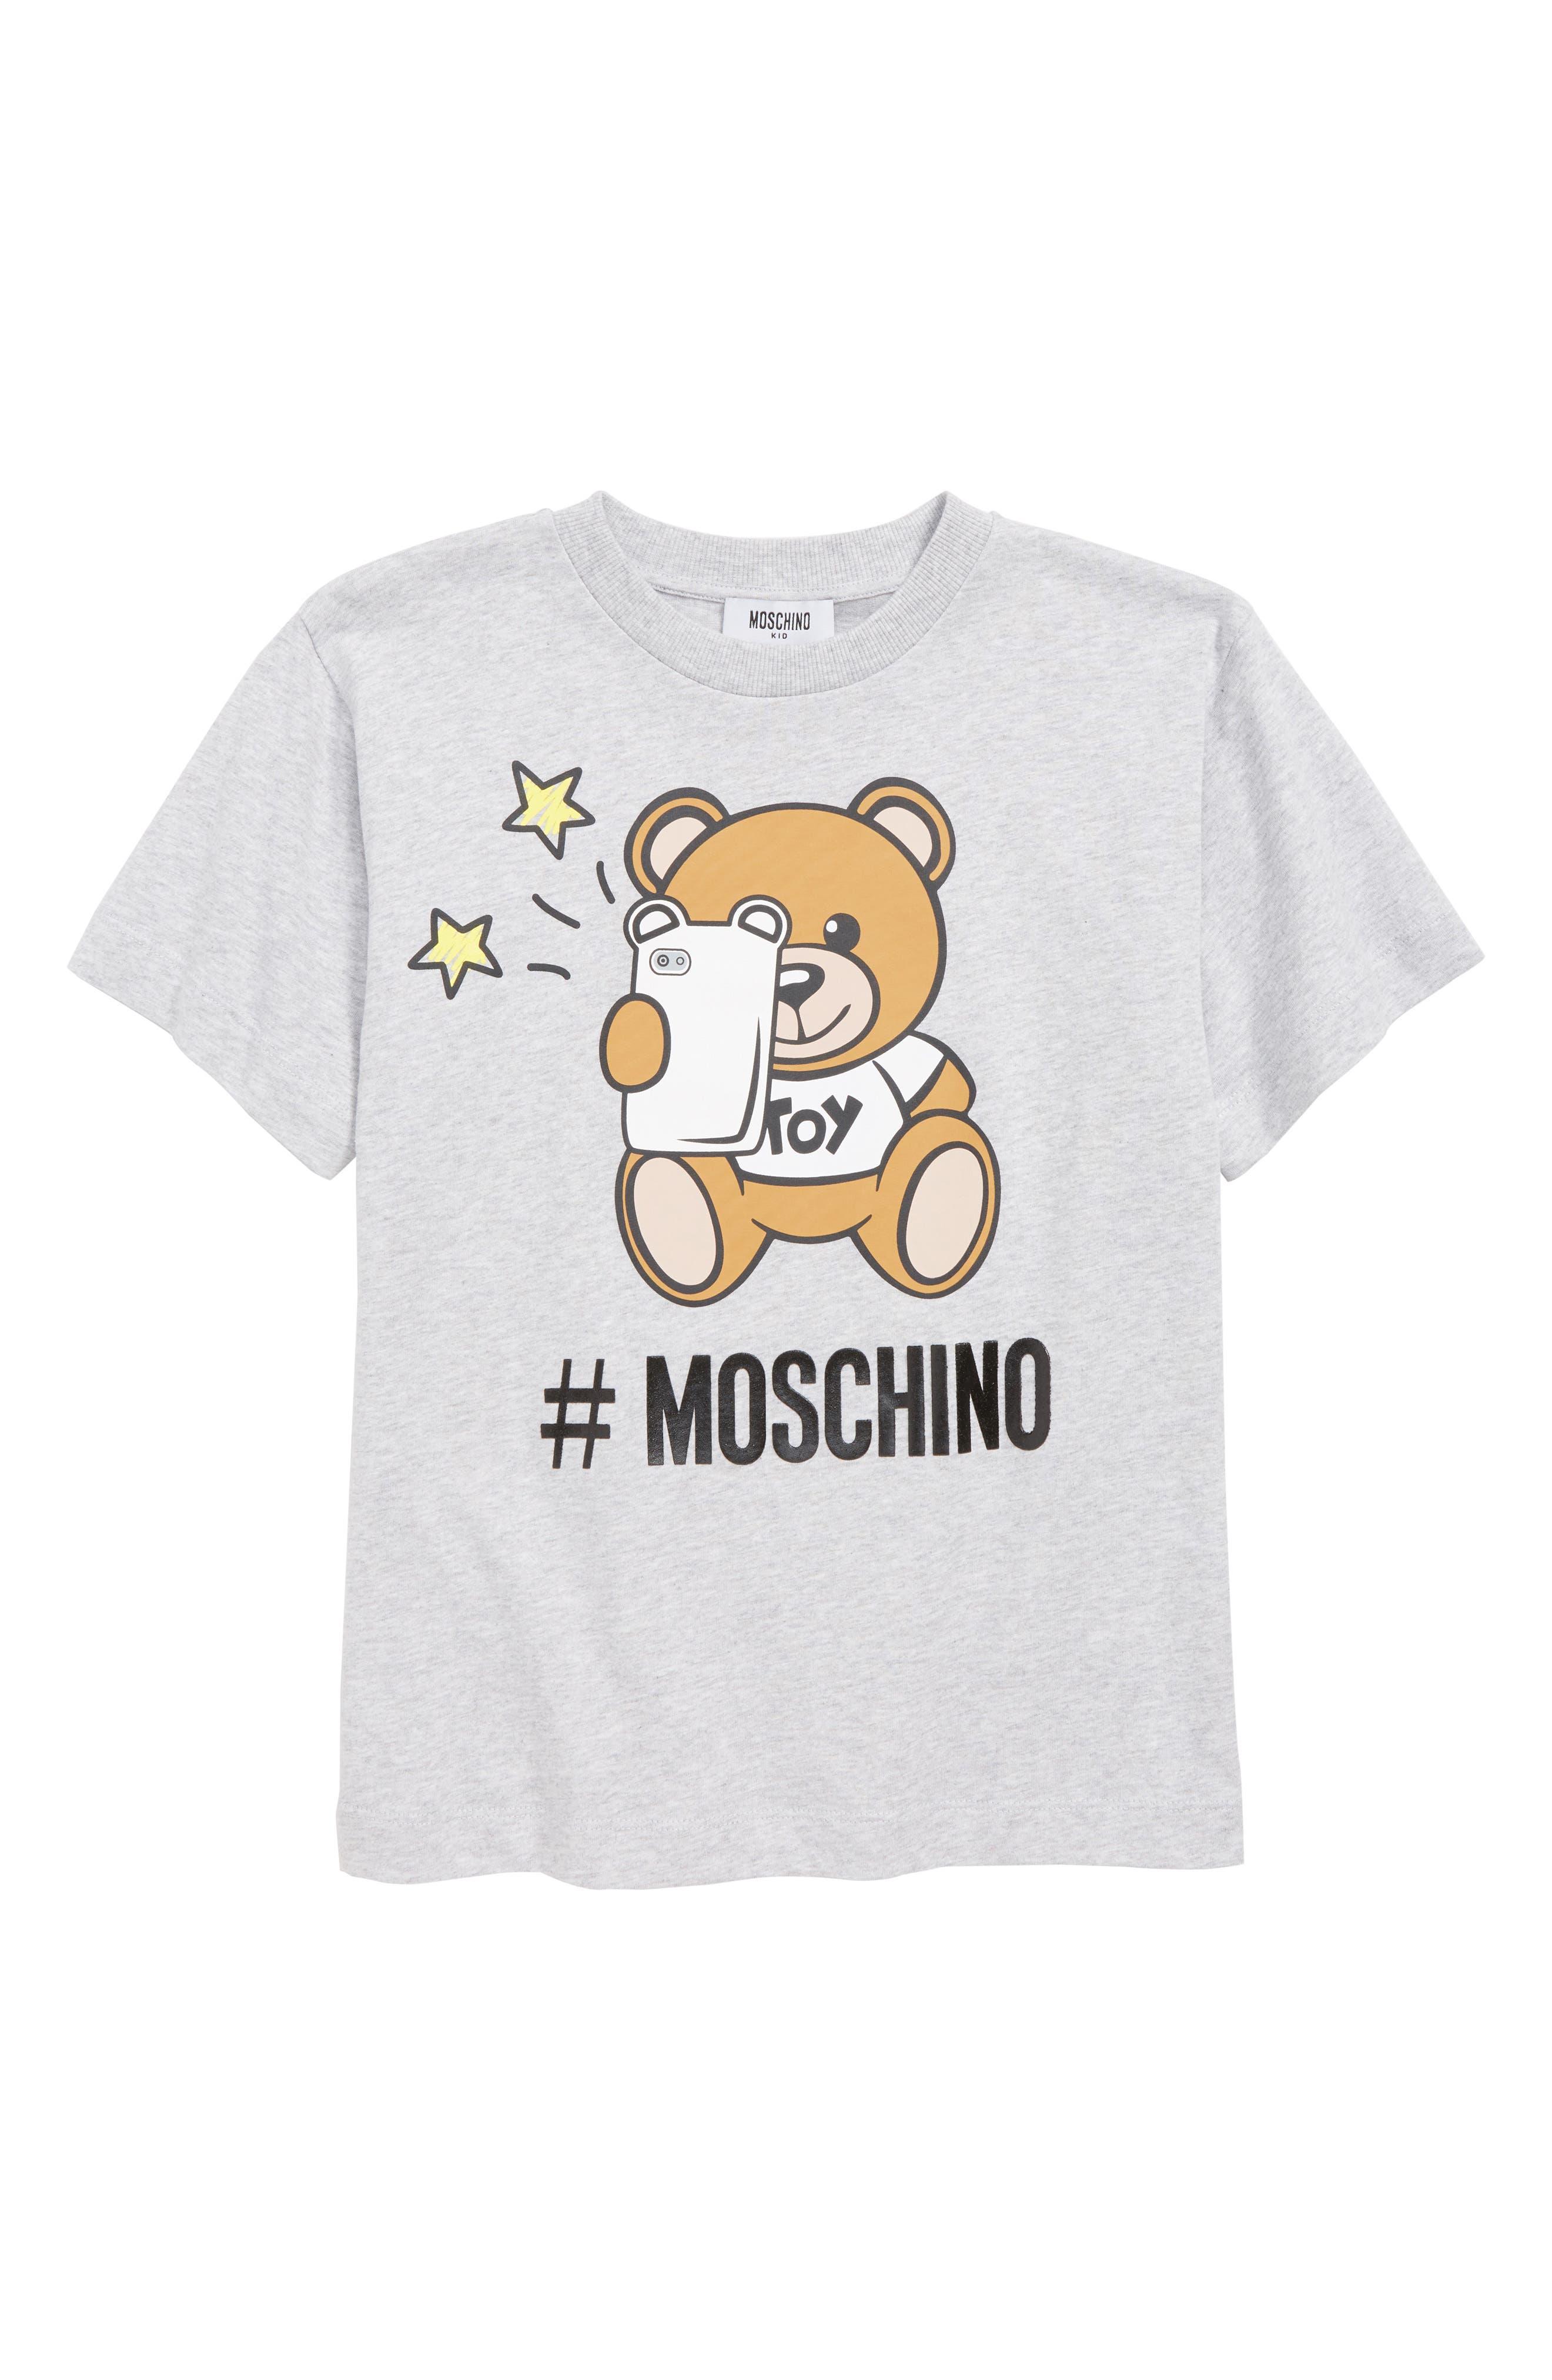 MOSCHINO, Logo Teddy Bear & Phone Screenprint Tee, Main thumbnail 1, color, 60901 GREY